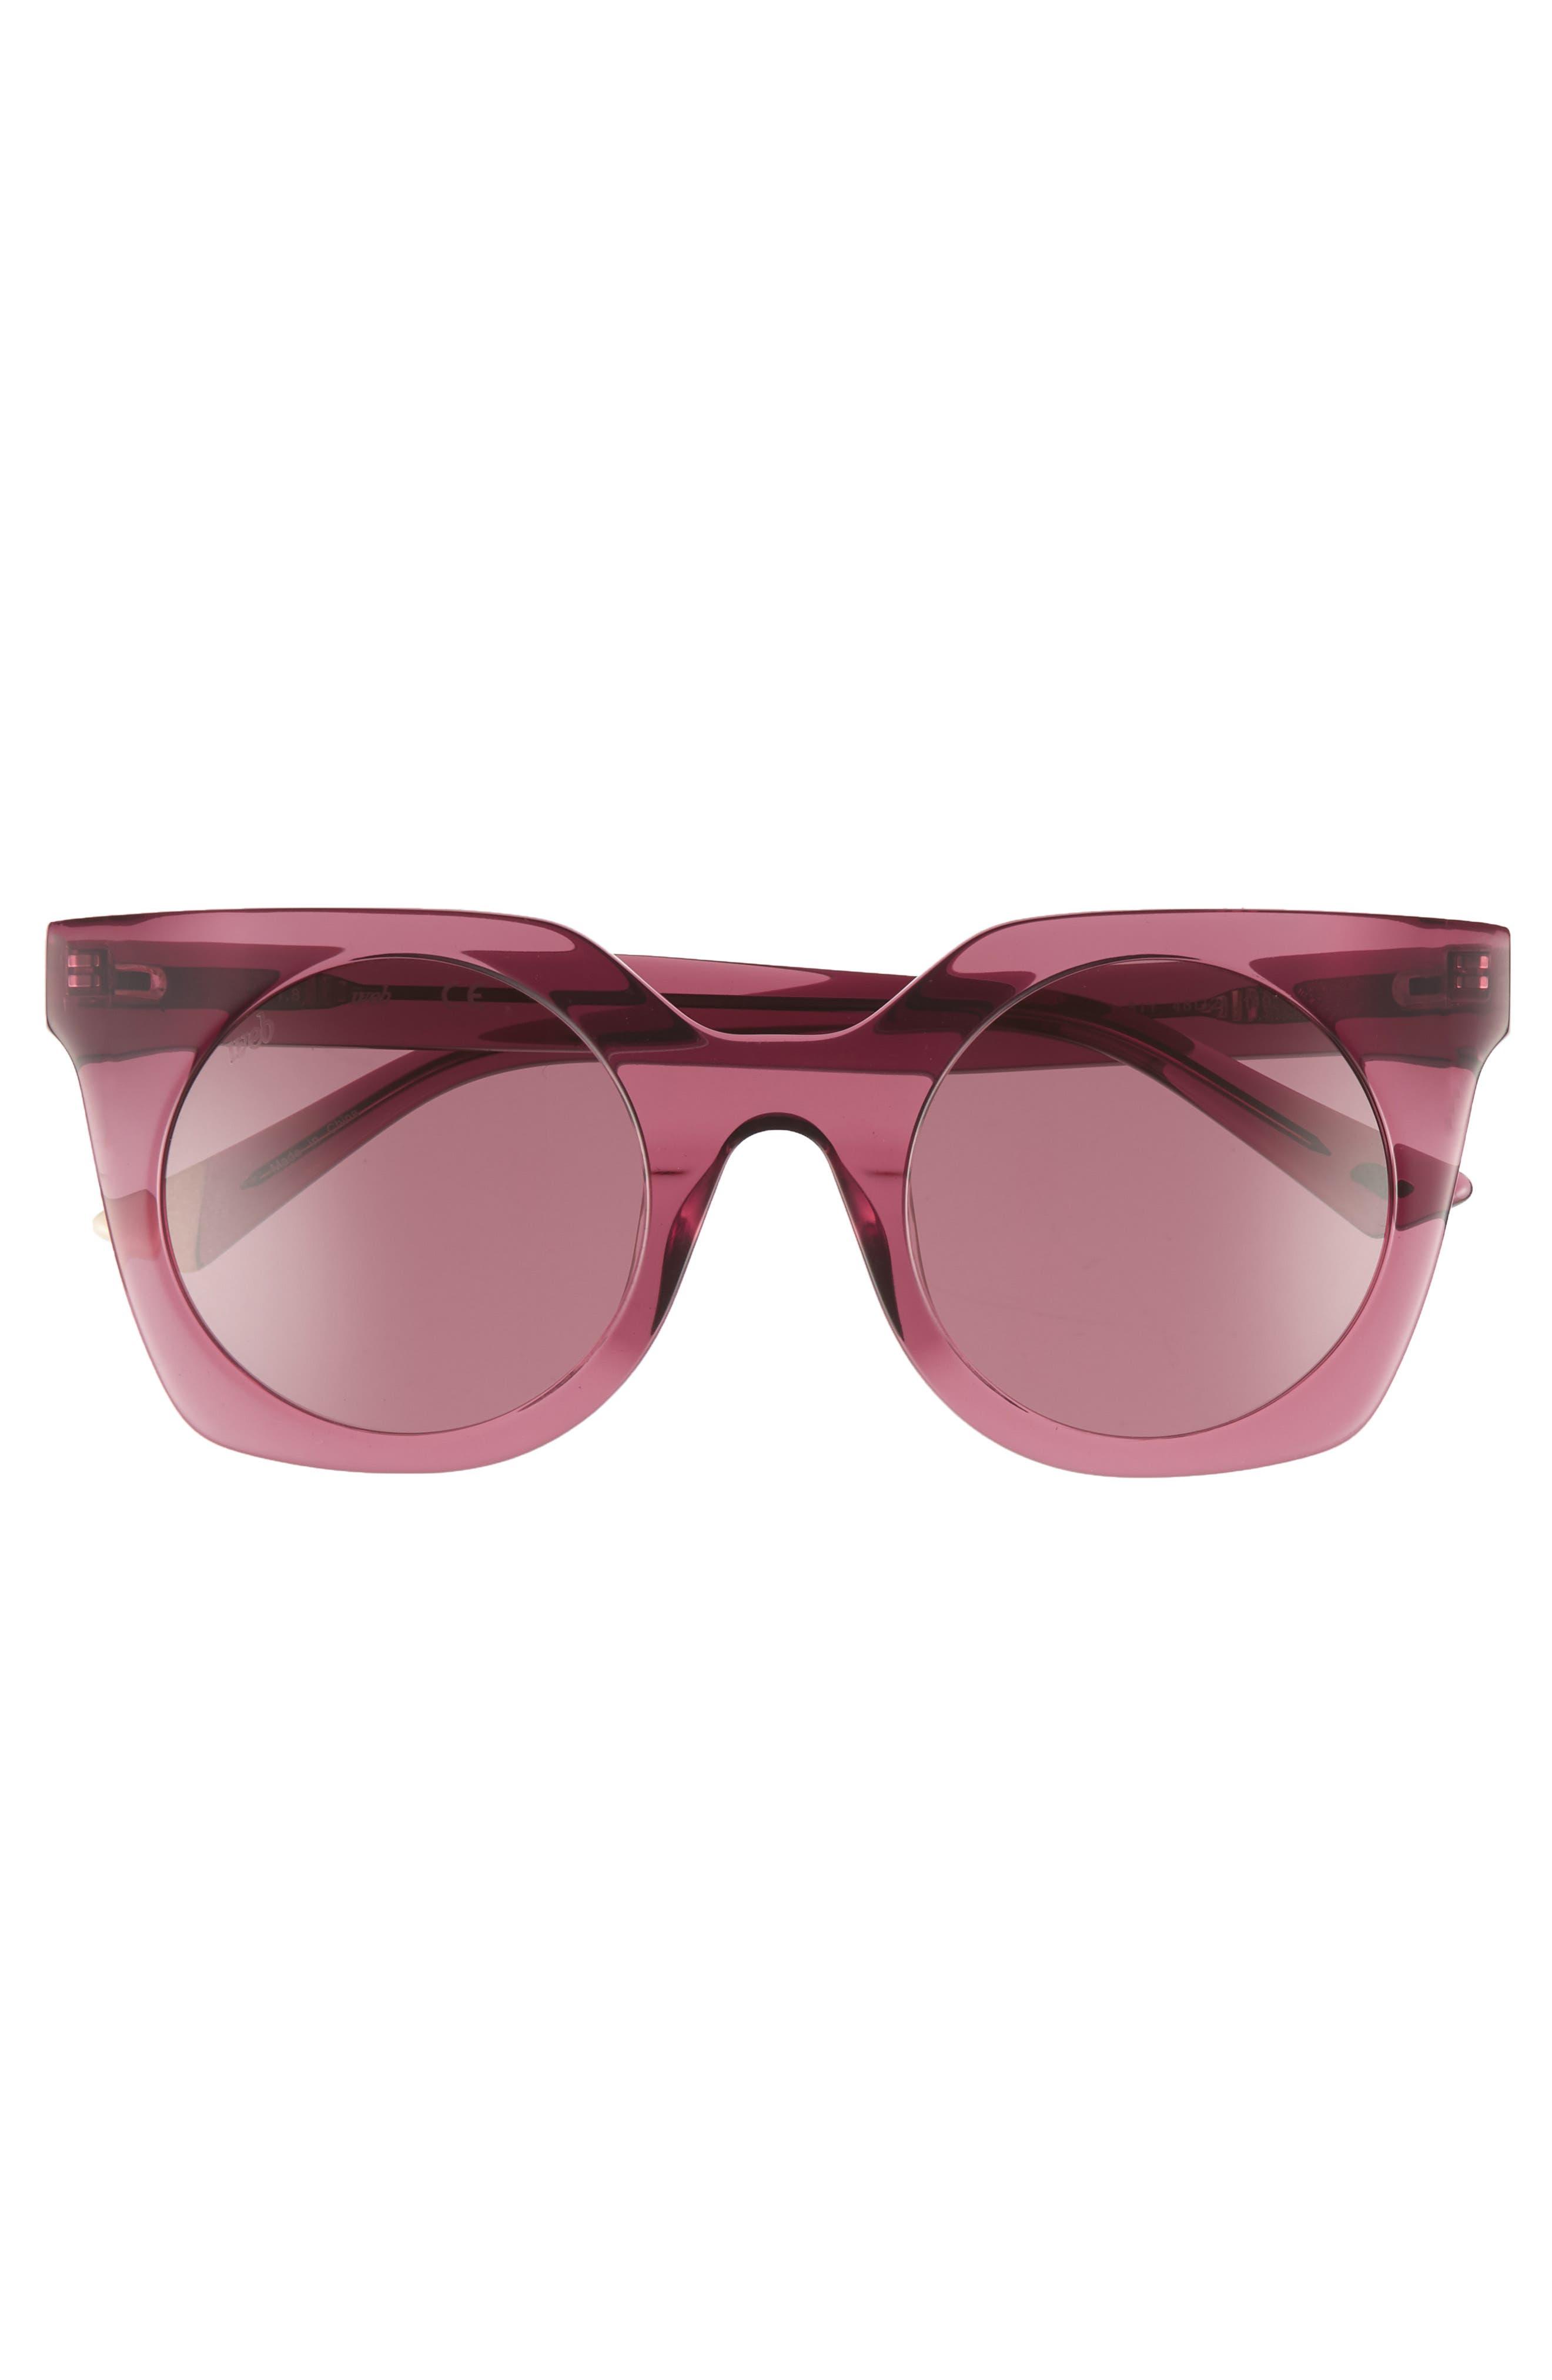 48mm Sunglasses,                             Alternate thumbnail 3, color,                             Shiny Violet/ Violet